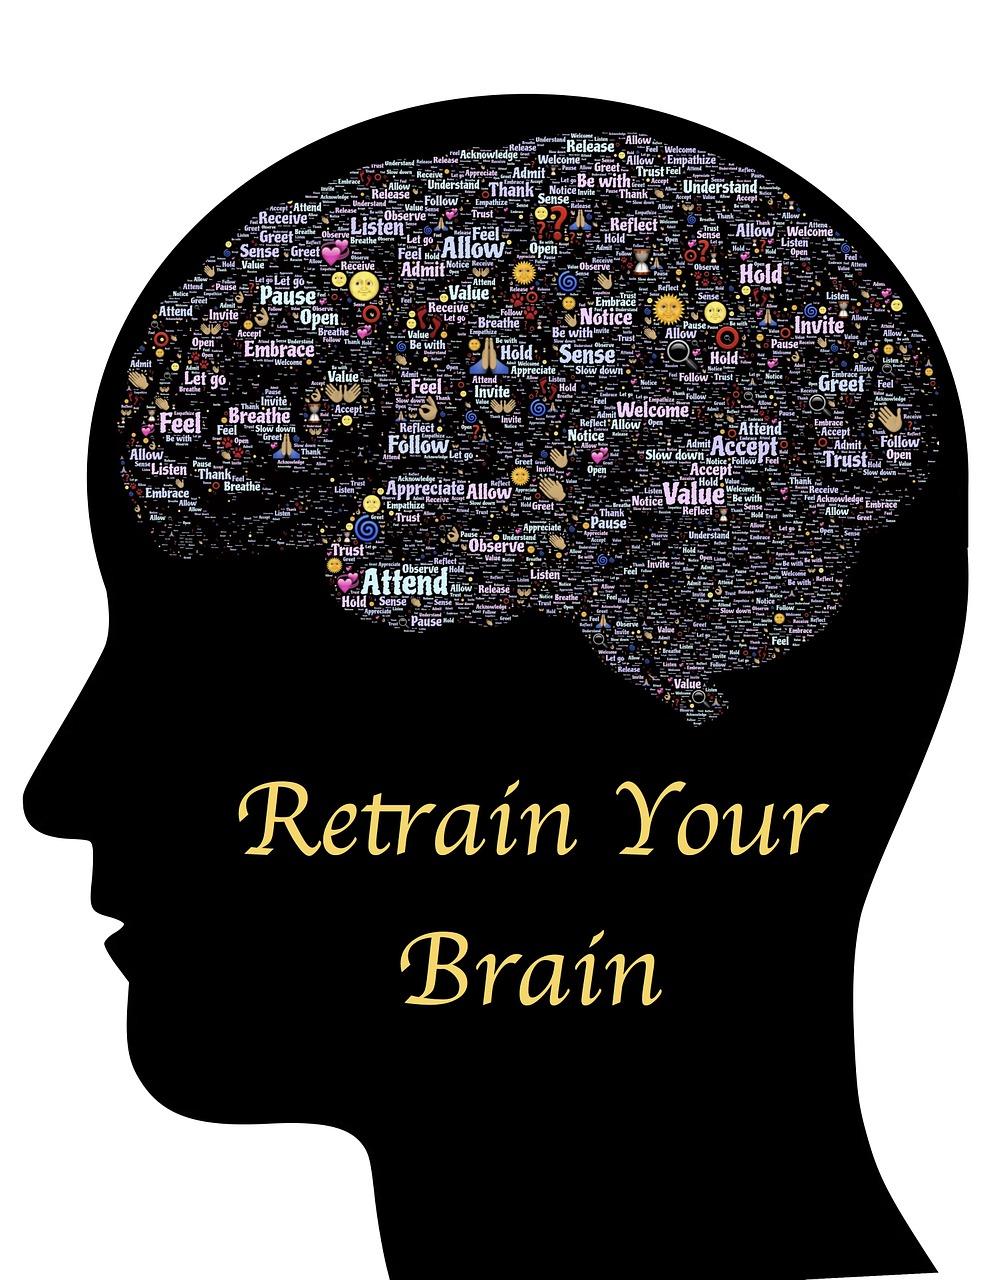 mindset-743167_1280.jpg